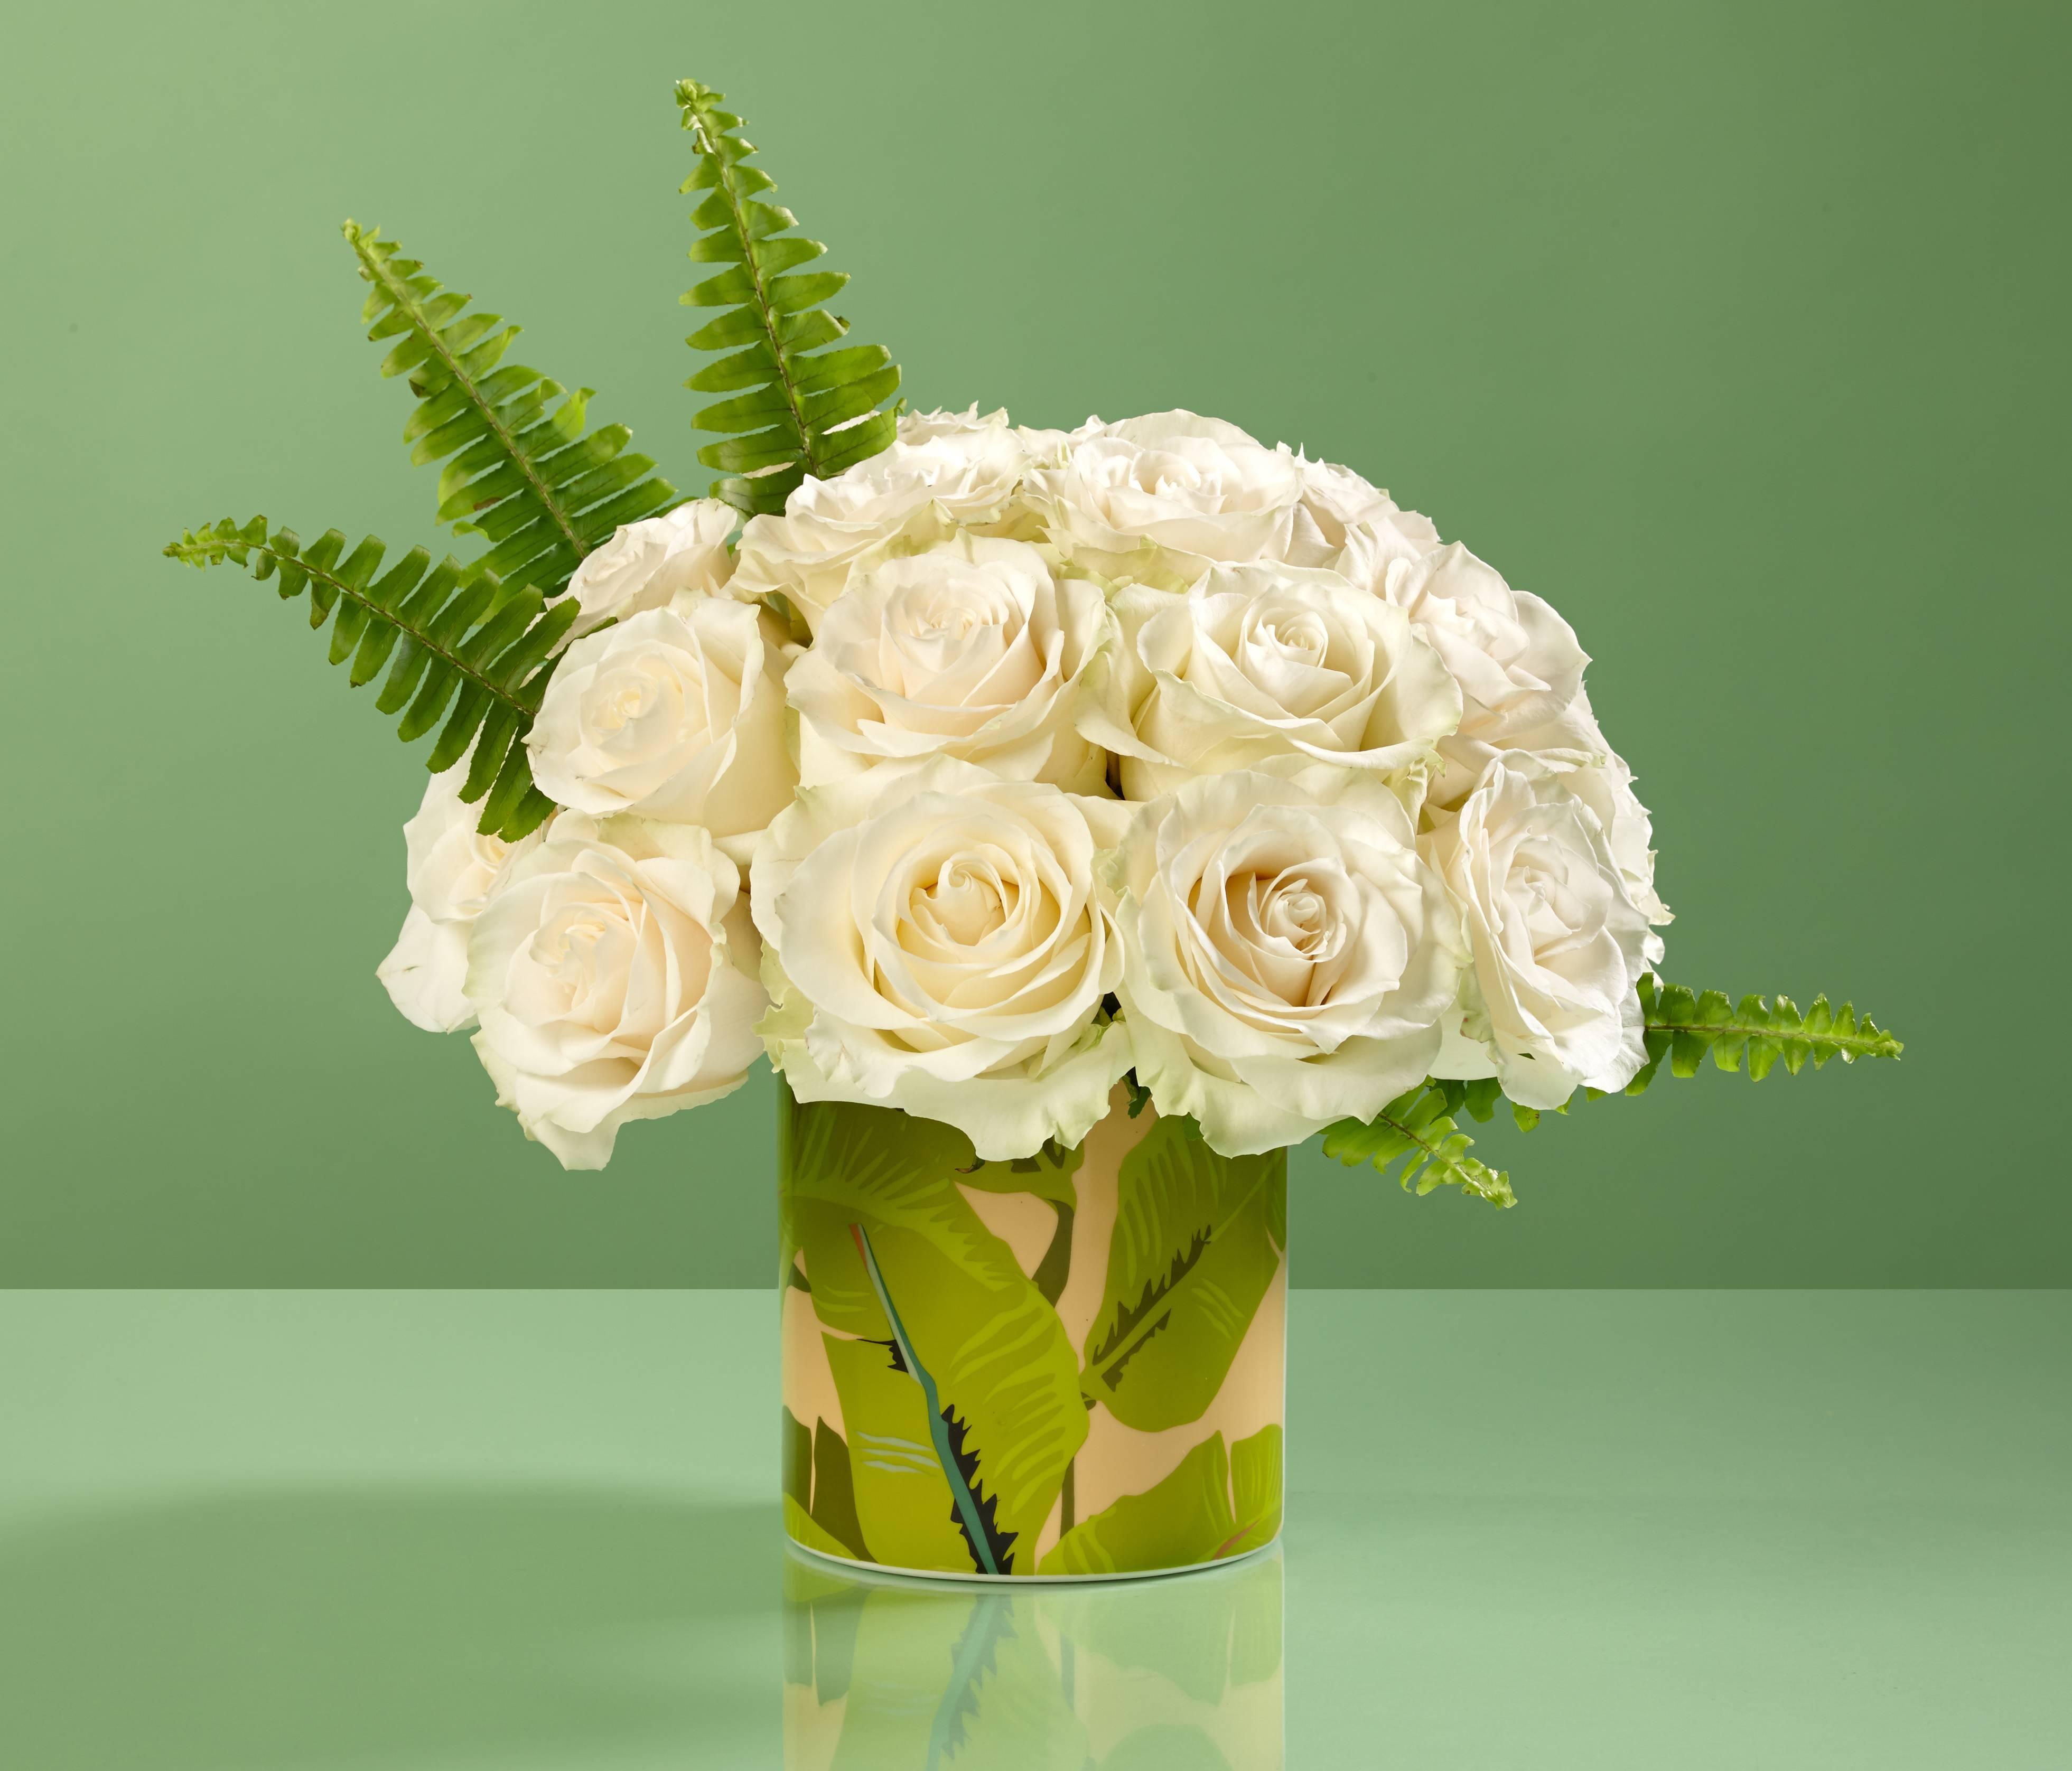 MIA: Upscale Florist Kalla is Reborn as Olyve